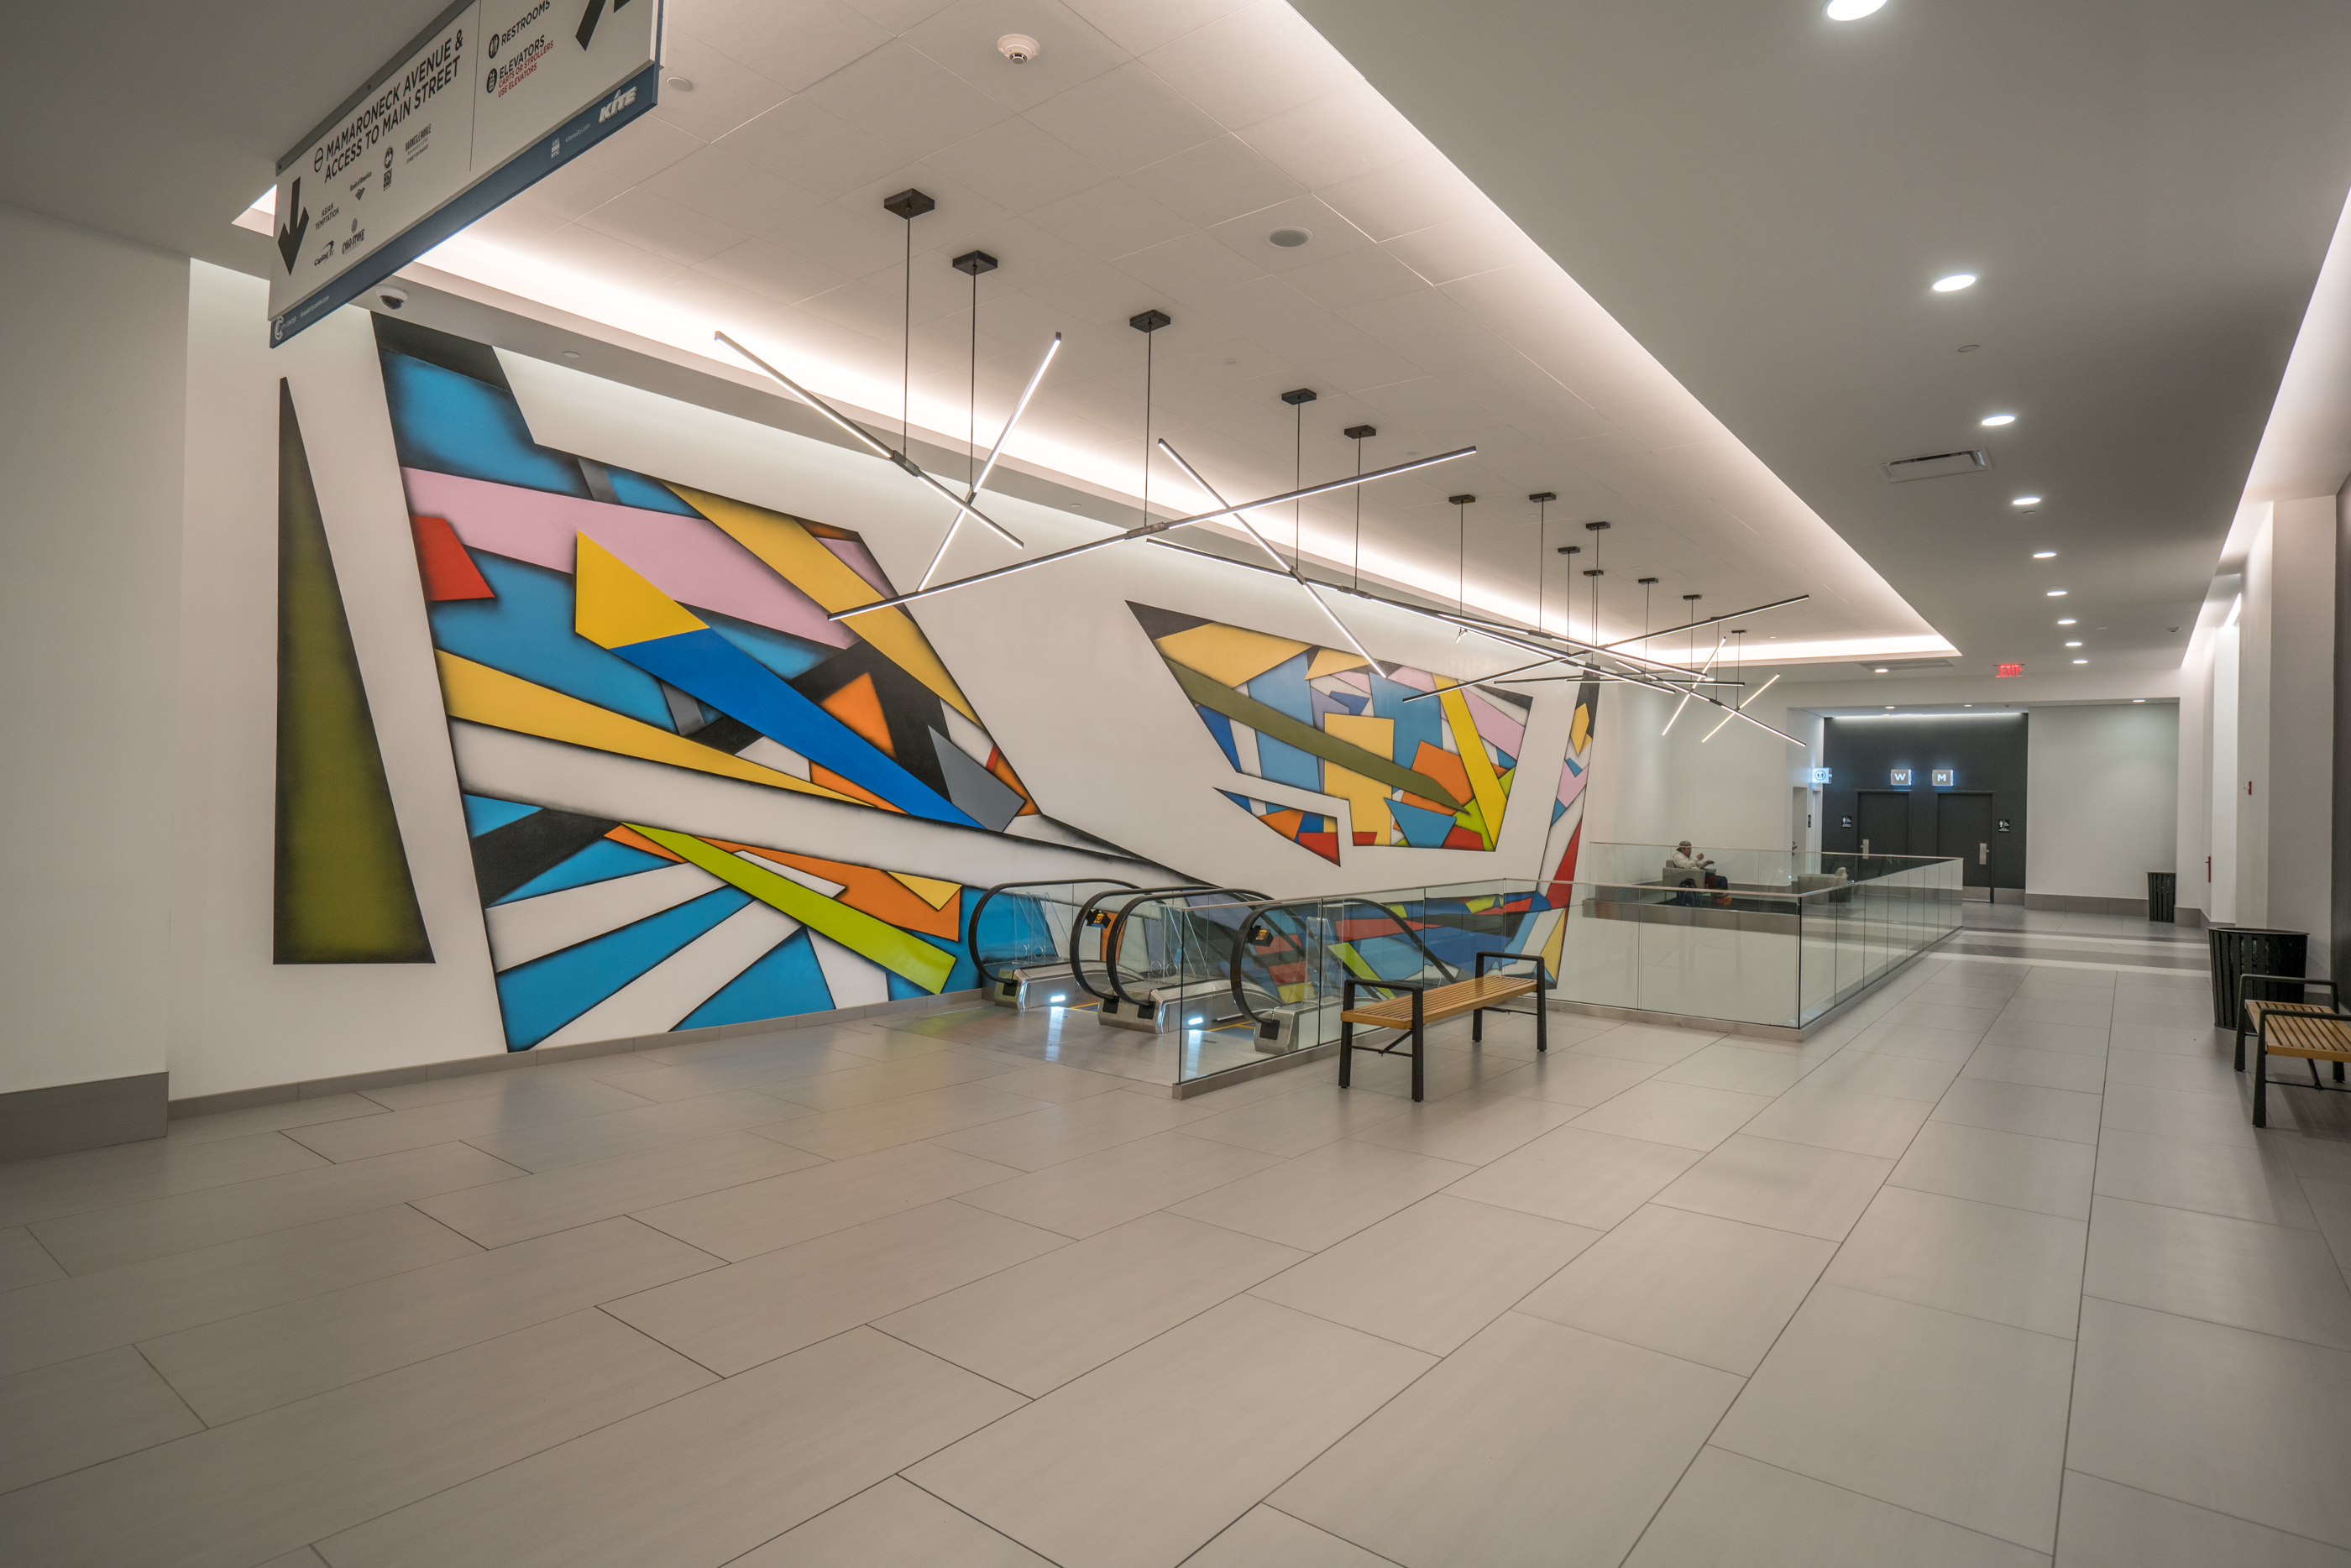 City Center escalator and wall mural